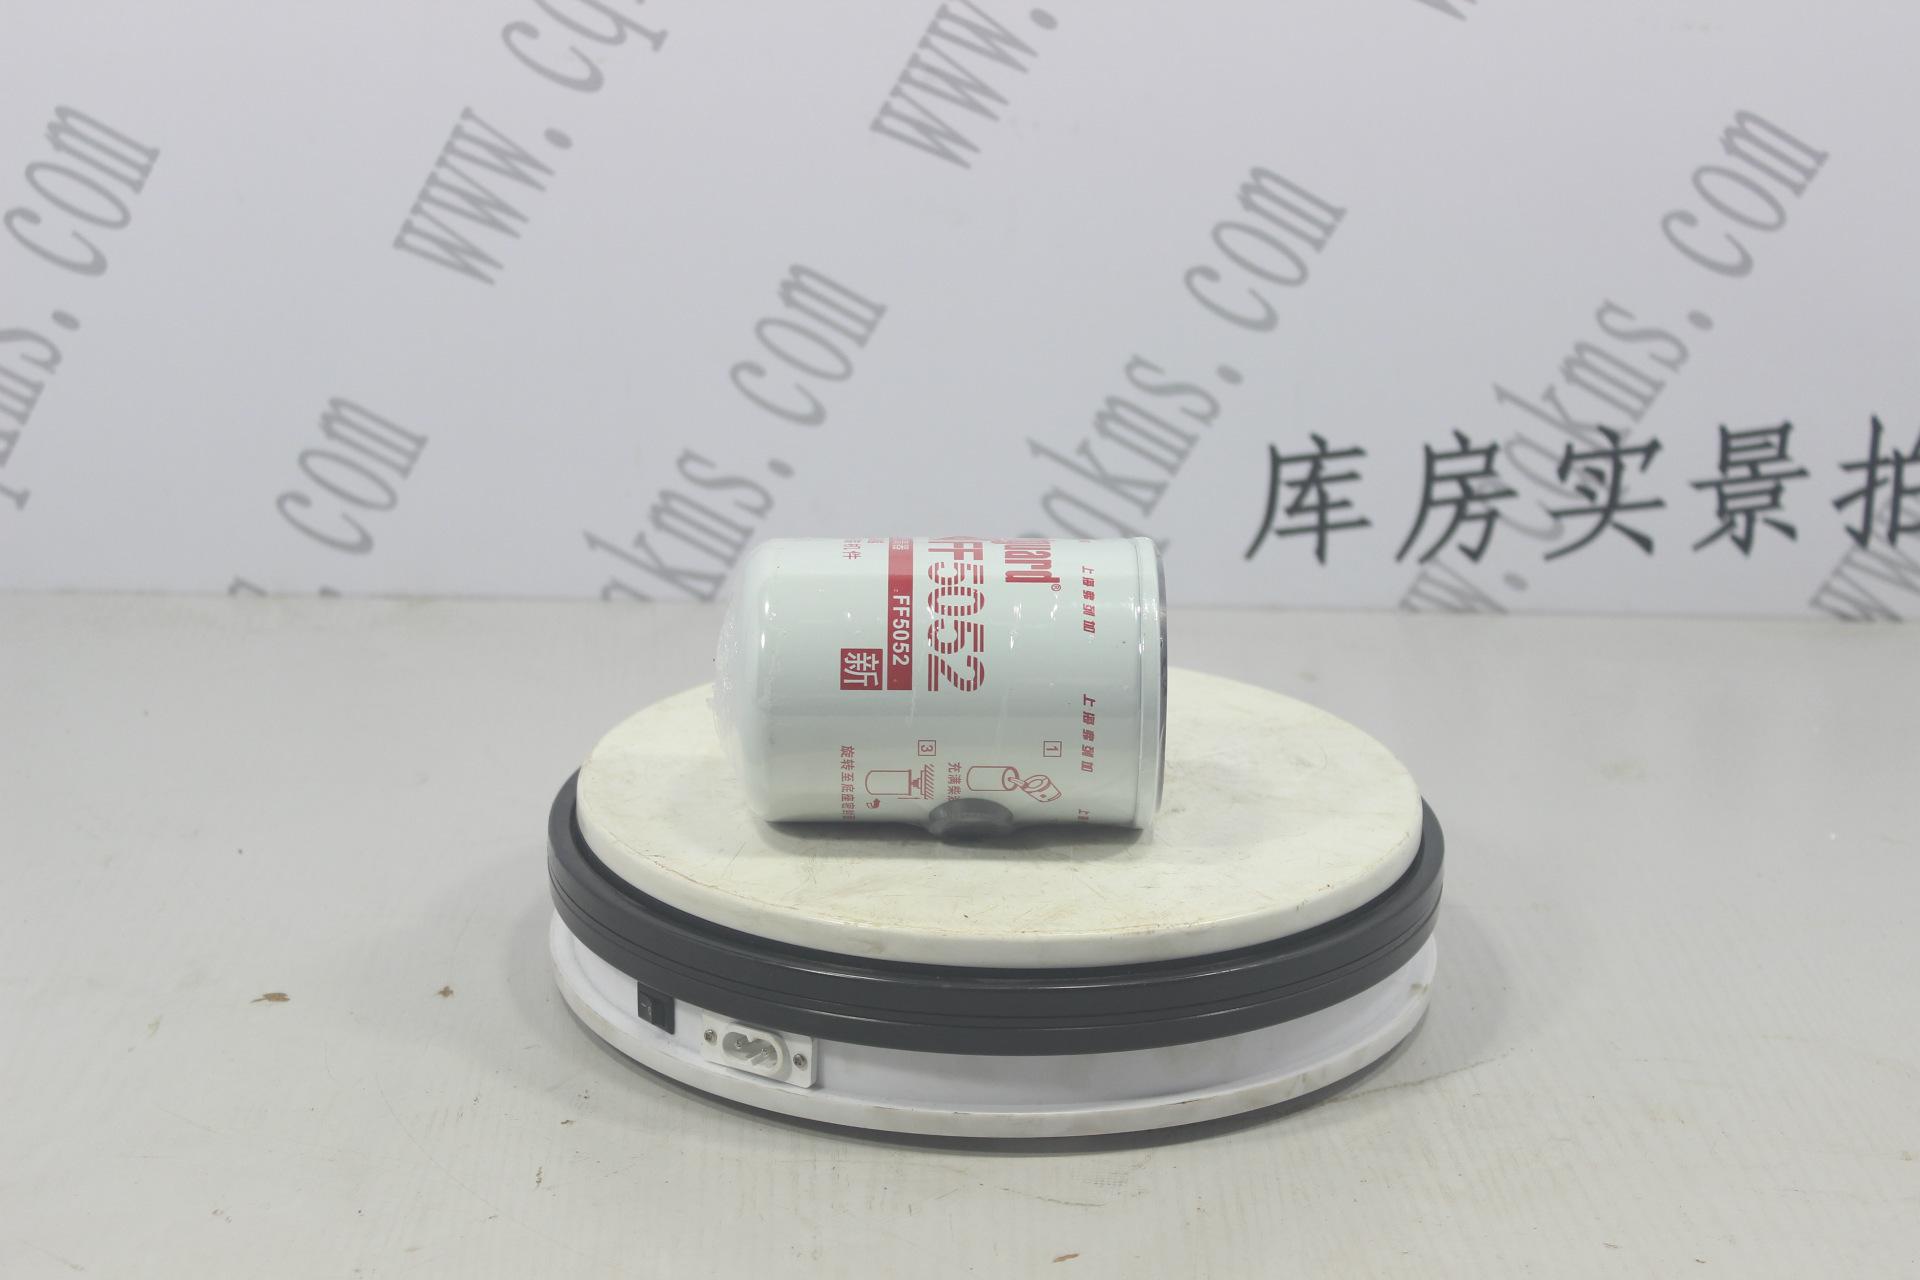 kms01725-FF5052-滤清器-用于4BT康明斯发动机-4BT-参考规格高10.6cm,外径7.6cm-参考重量400-400图片4